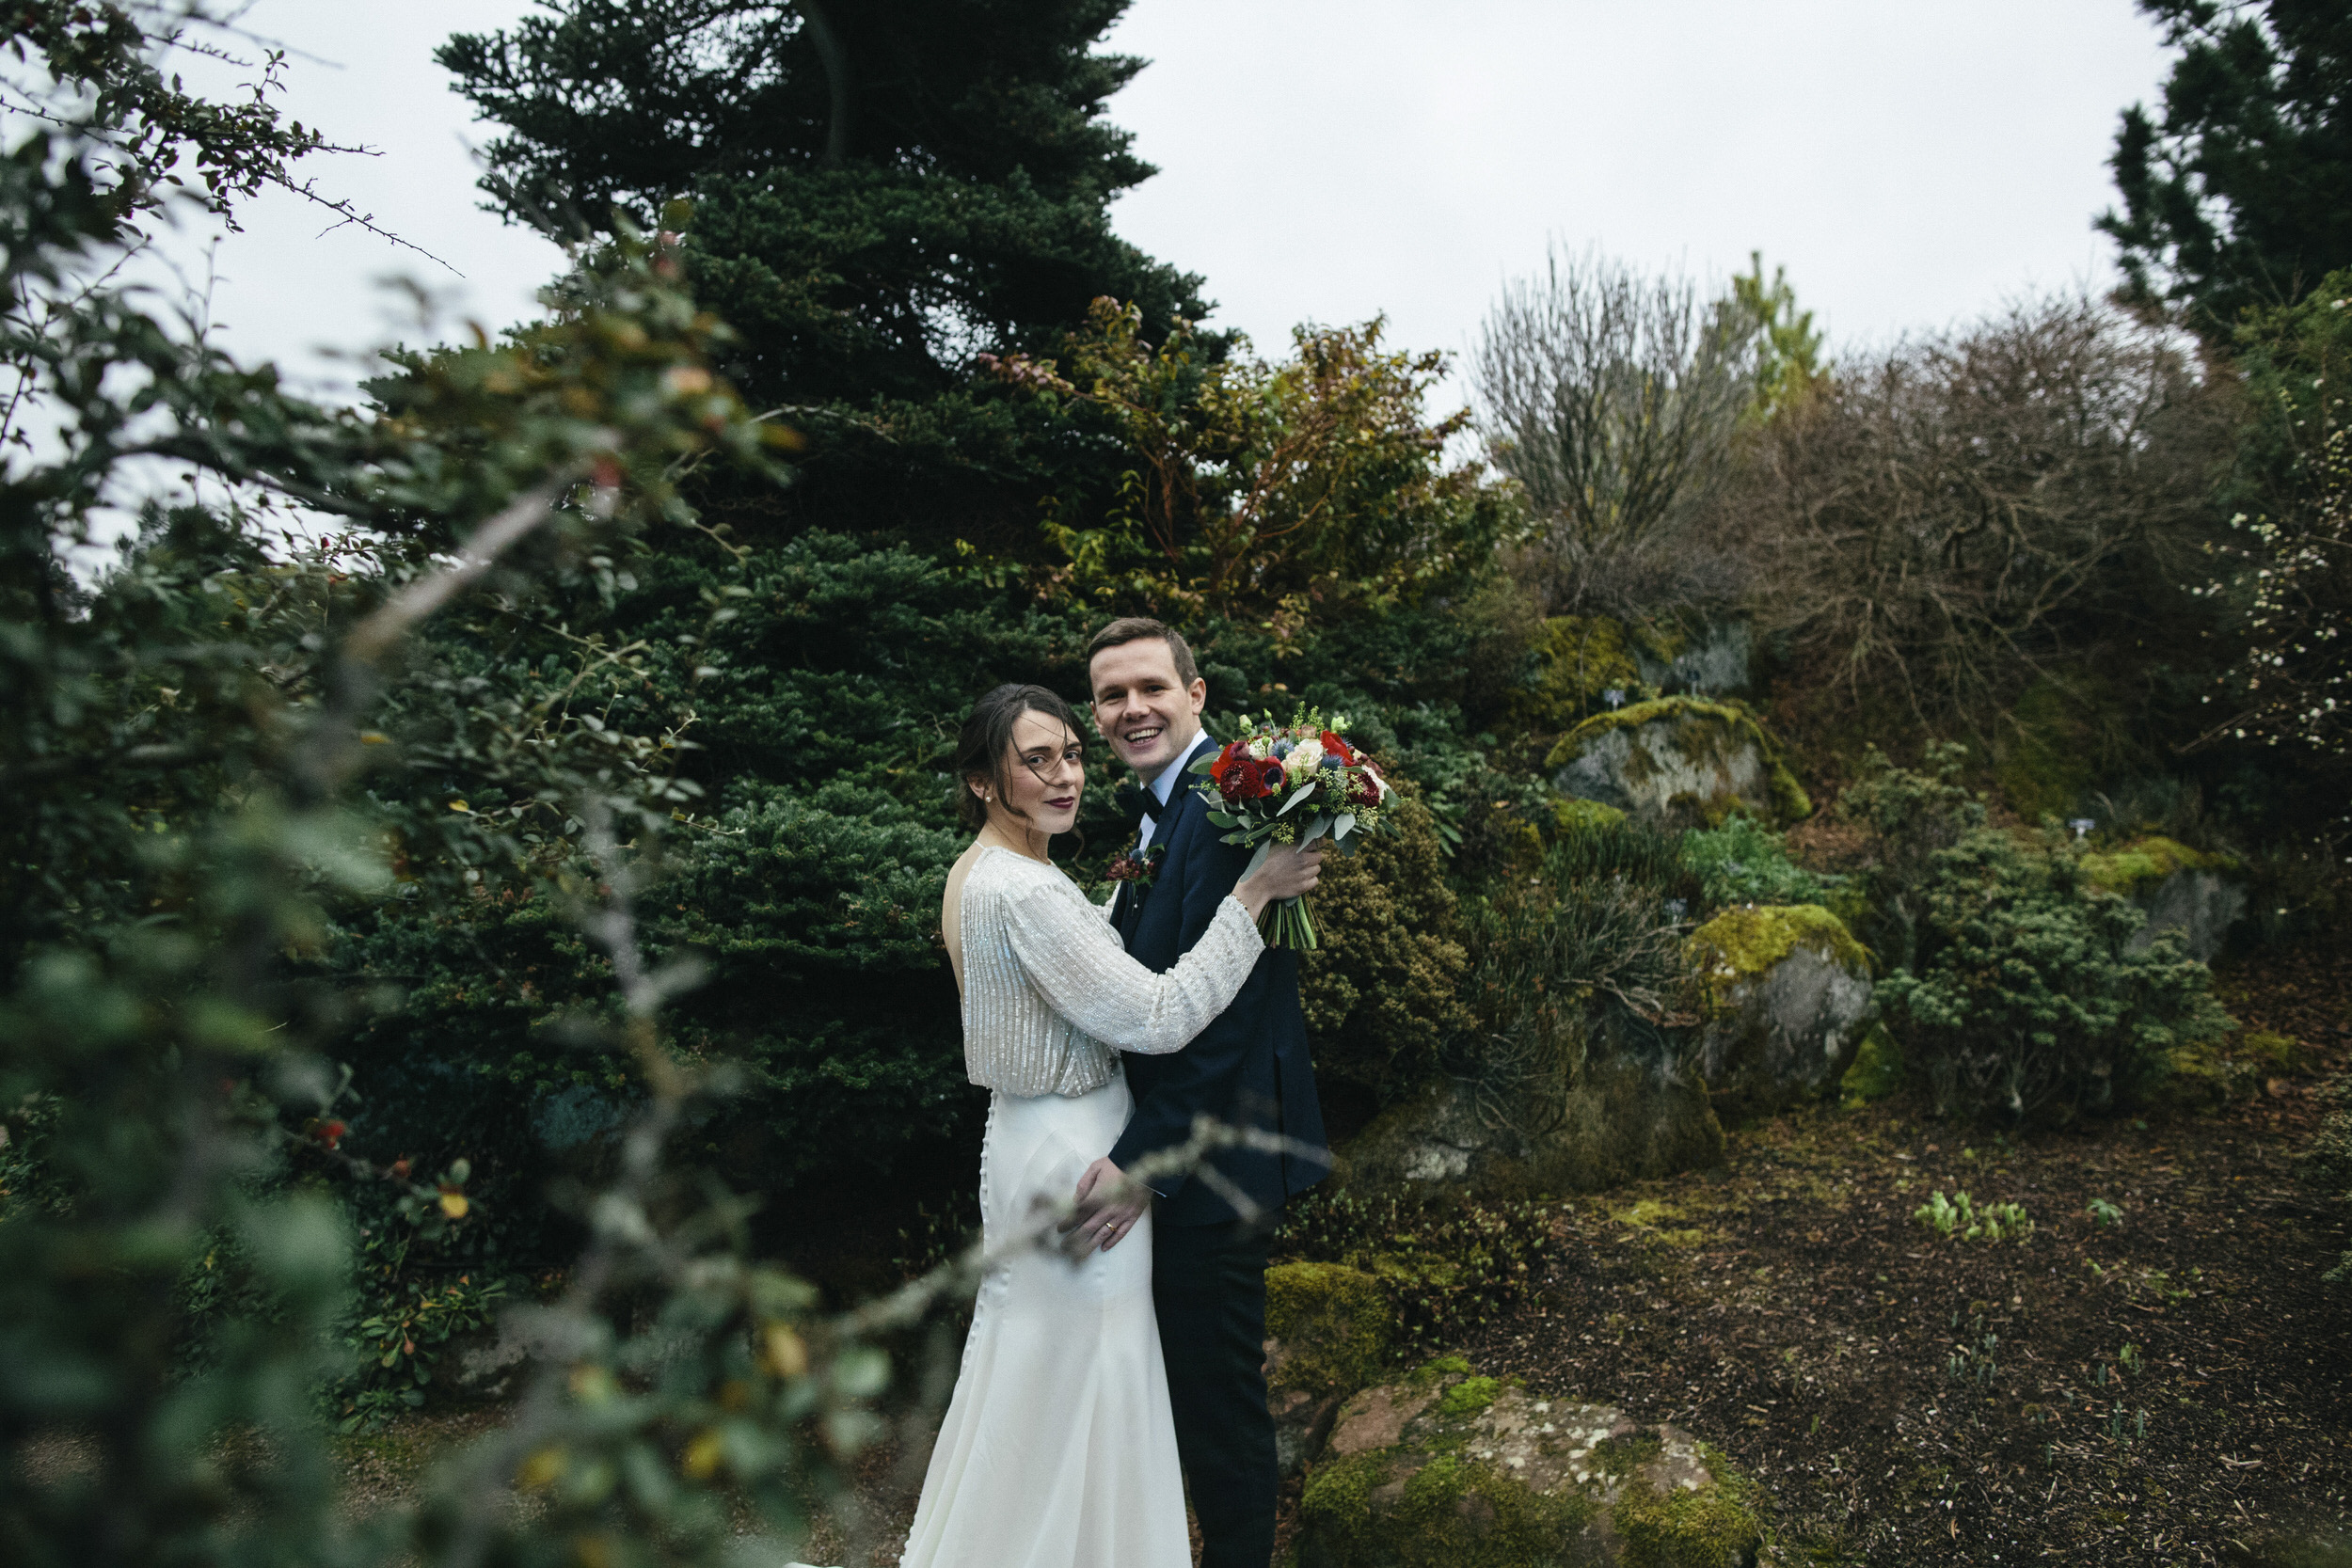 Quirky Wedding Photographer Scotland Glasgow Edinburgh Mirrorbox 133.jpg